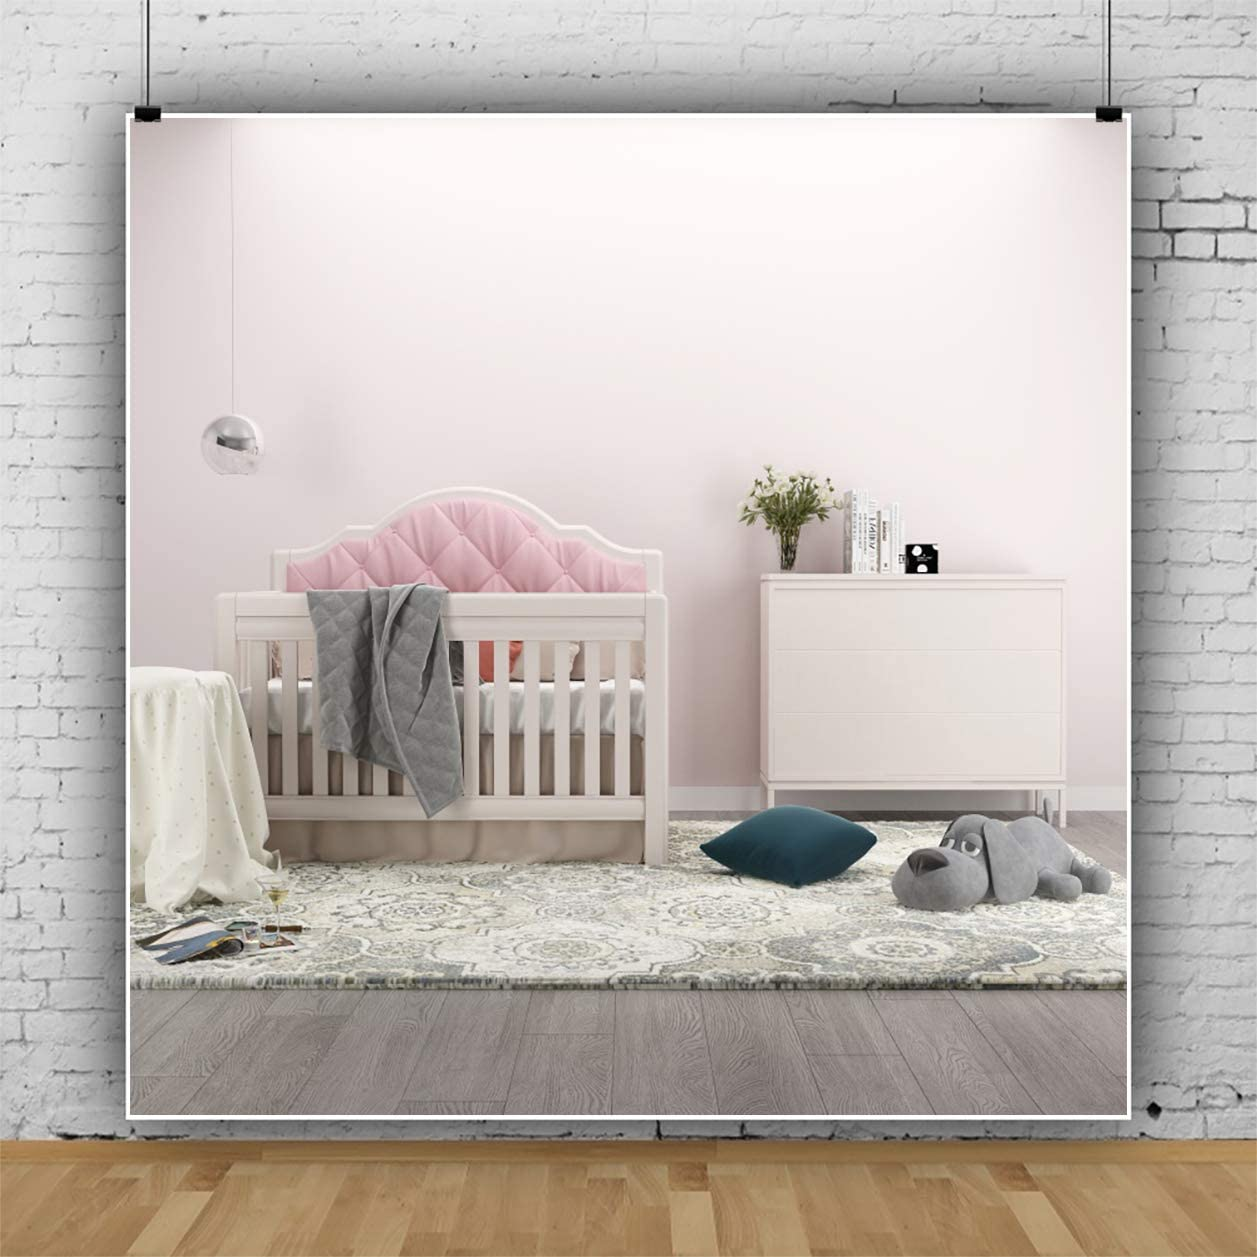 YEELE Kids Room Backdrop 10x10ft Modern Baby Crib Indoor Photography Background Fashion House and Home Design Kids Newborn Toddler Infant Portrait Photo Studio Props Digital Wallpaper